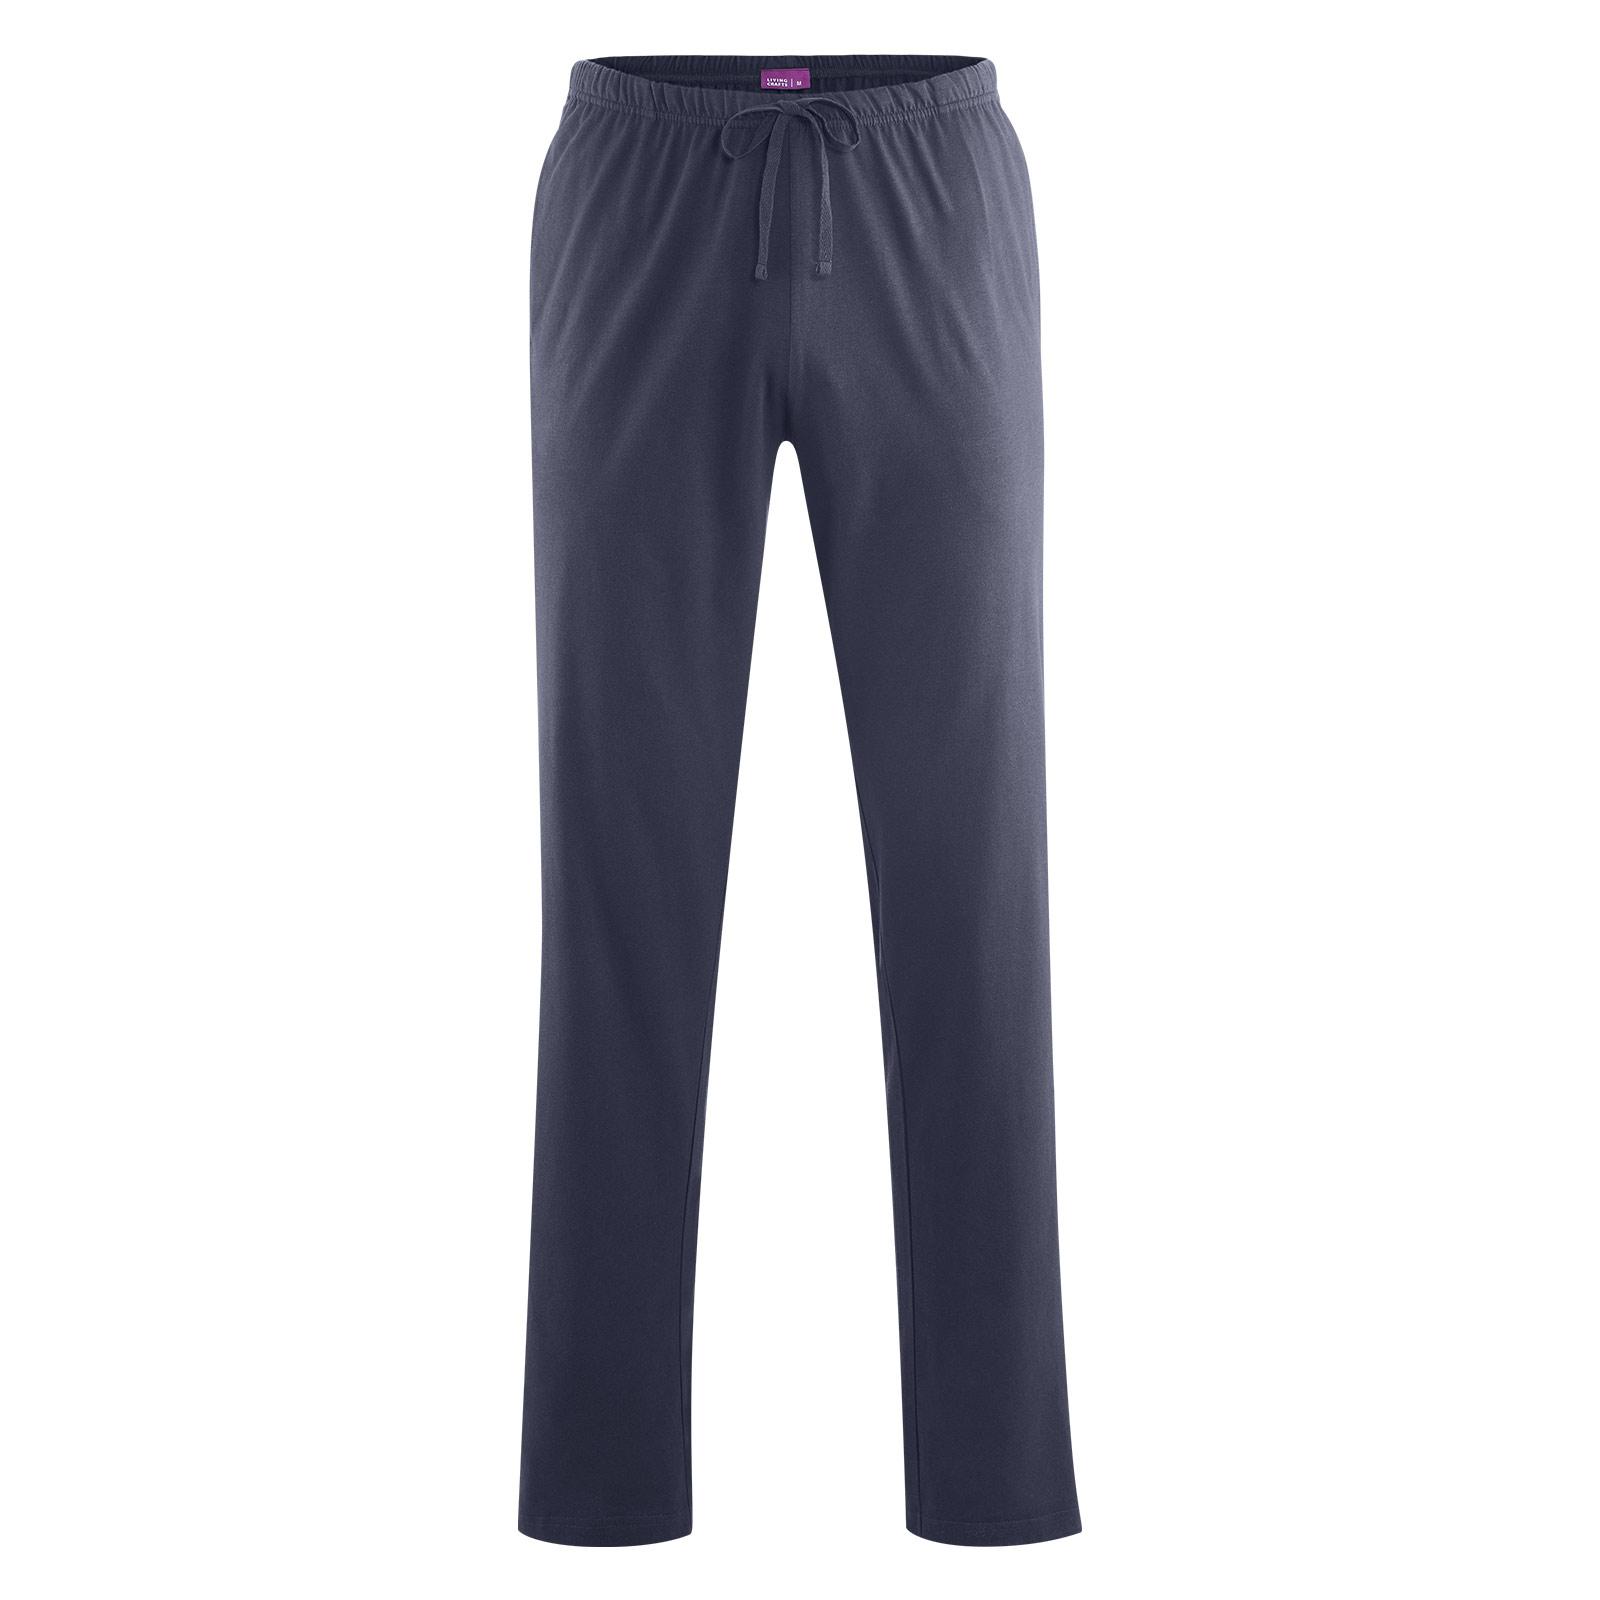 Living Crafts Jersey-Hose Herren aus veganer Bio-Baumwolle - PureNature 0ce9970bac